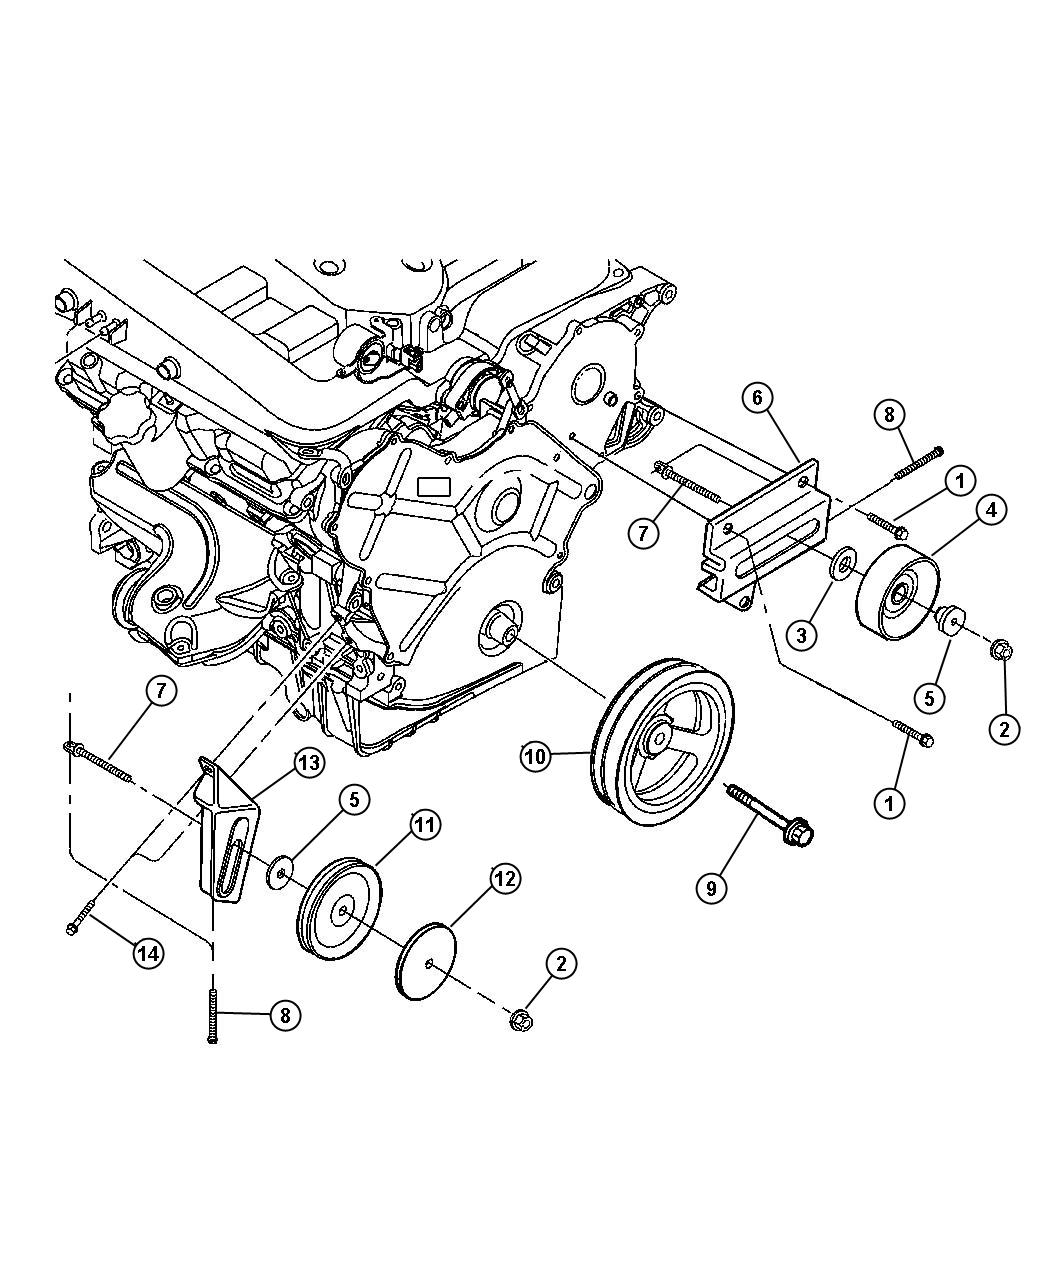 Dodge Intrepid 2 7 Engine Diagram Dodge Auto Wiring